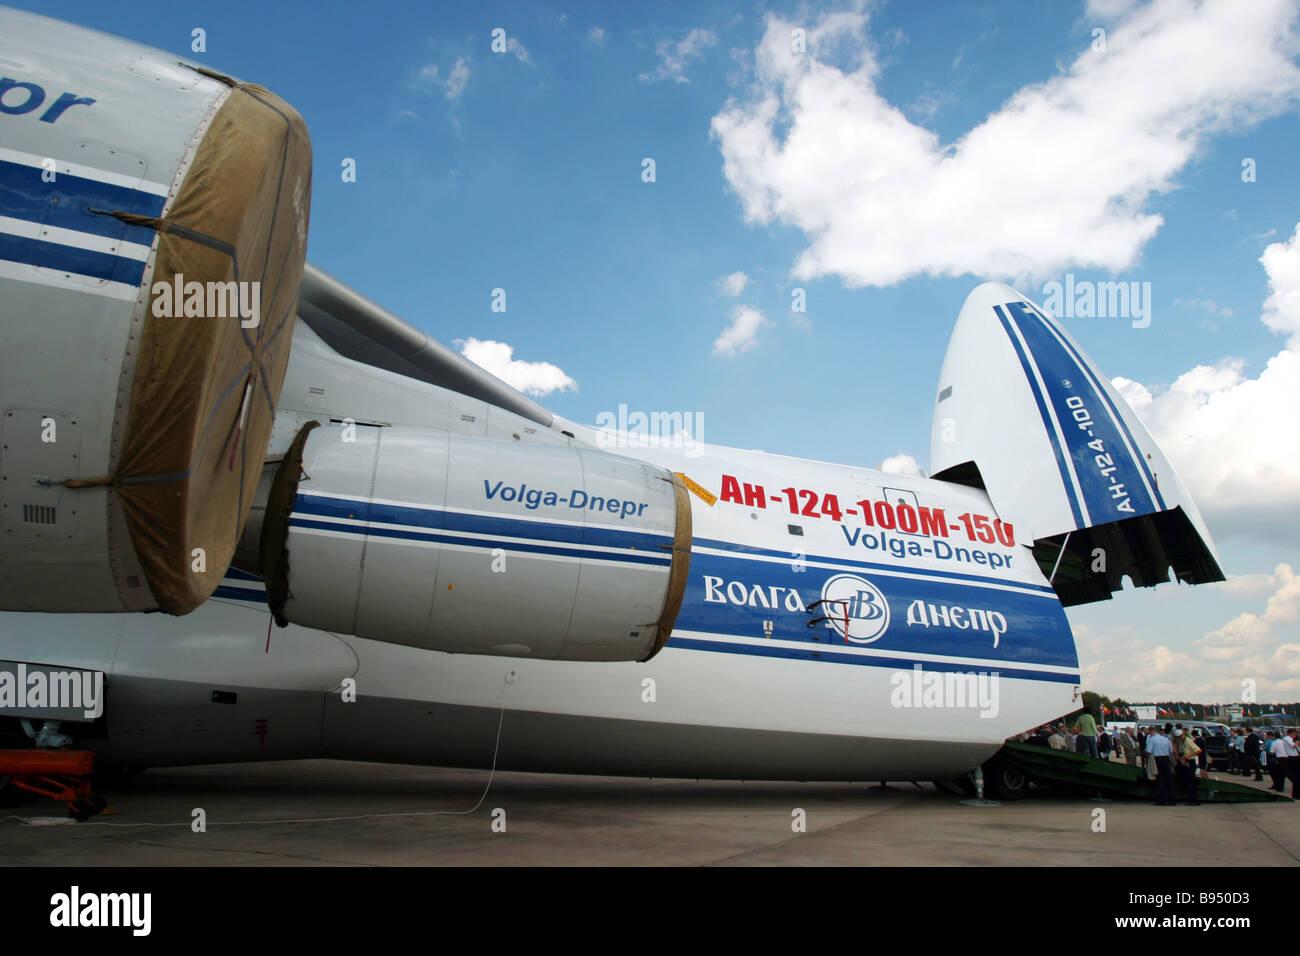 An AN 124 100M 150 cargo craft at the MAKS 2005 international aerospace show Stock Photo